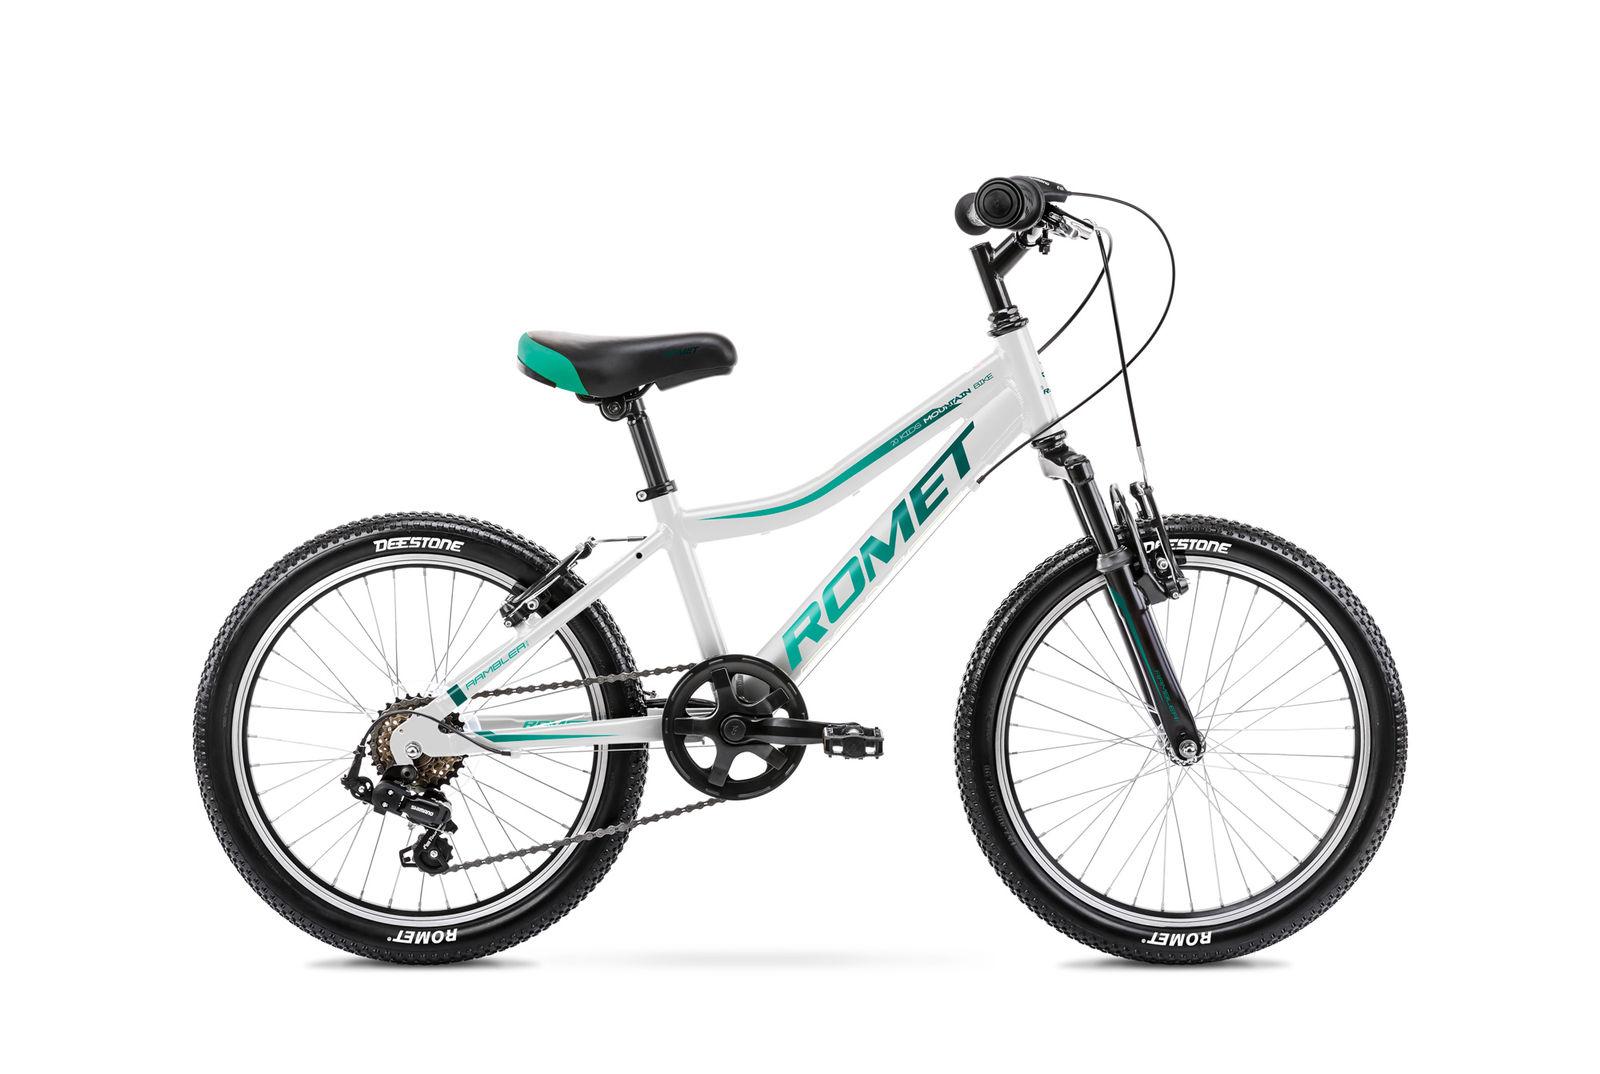 Bicicleta pentru copii Romet Rambler 20 Kid 2 S/10 Alb/Albastru 2021 imagine